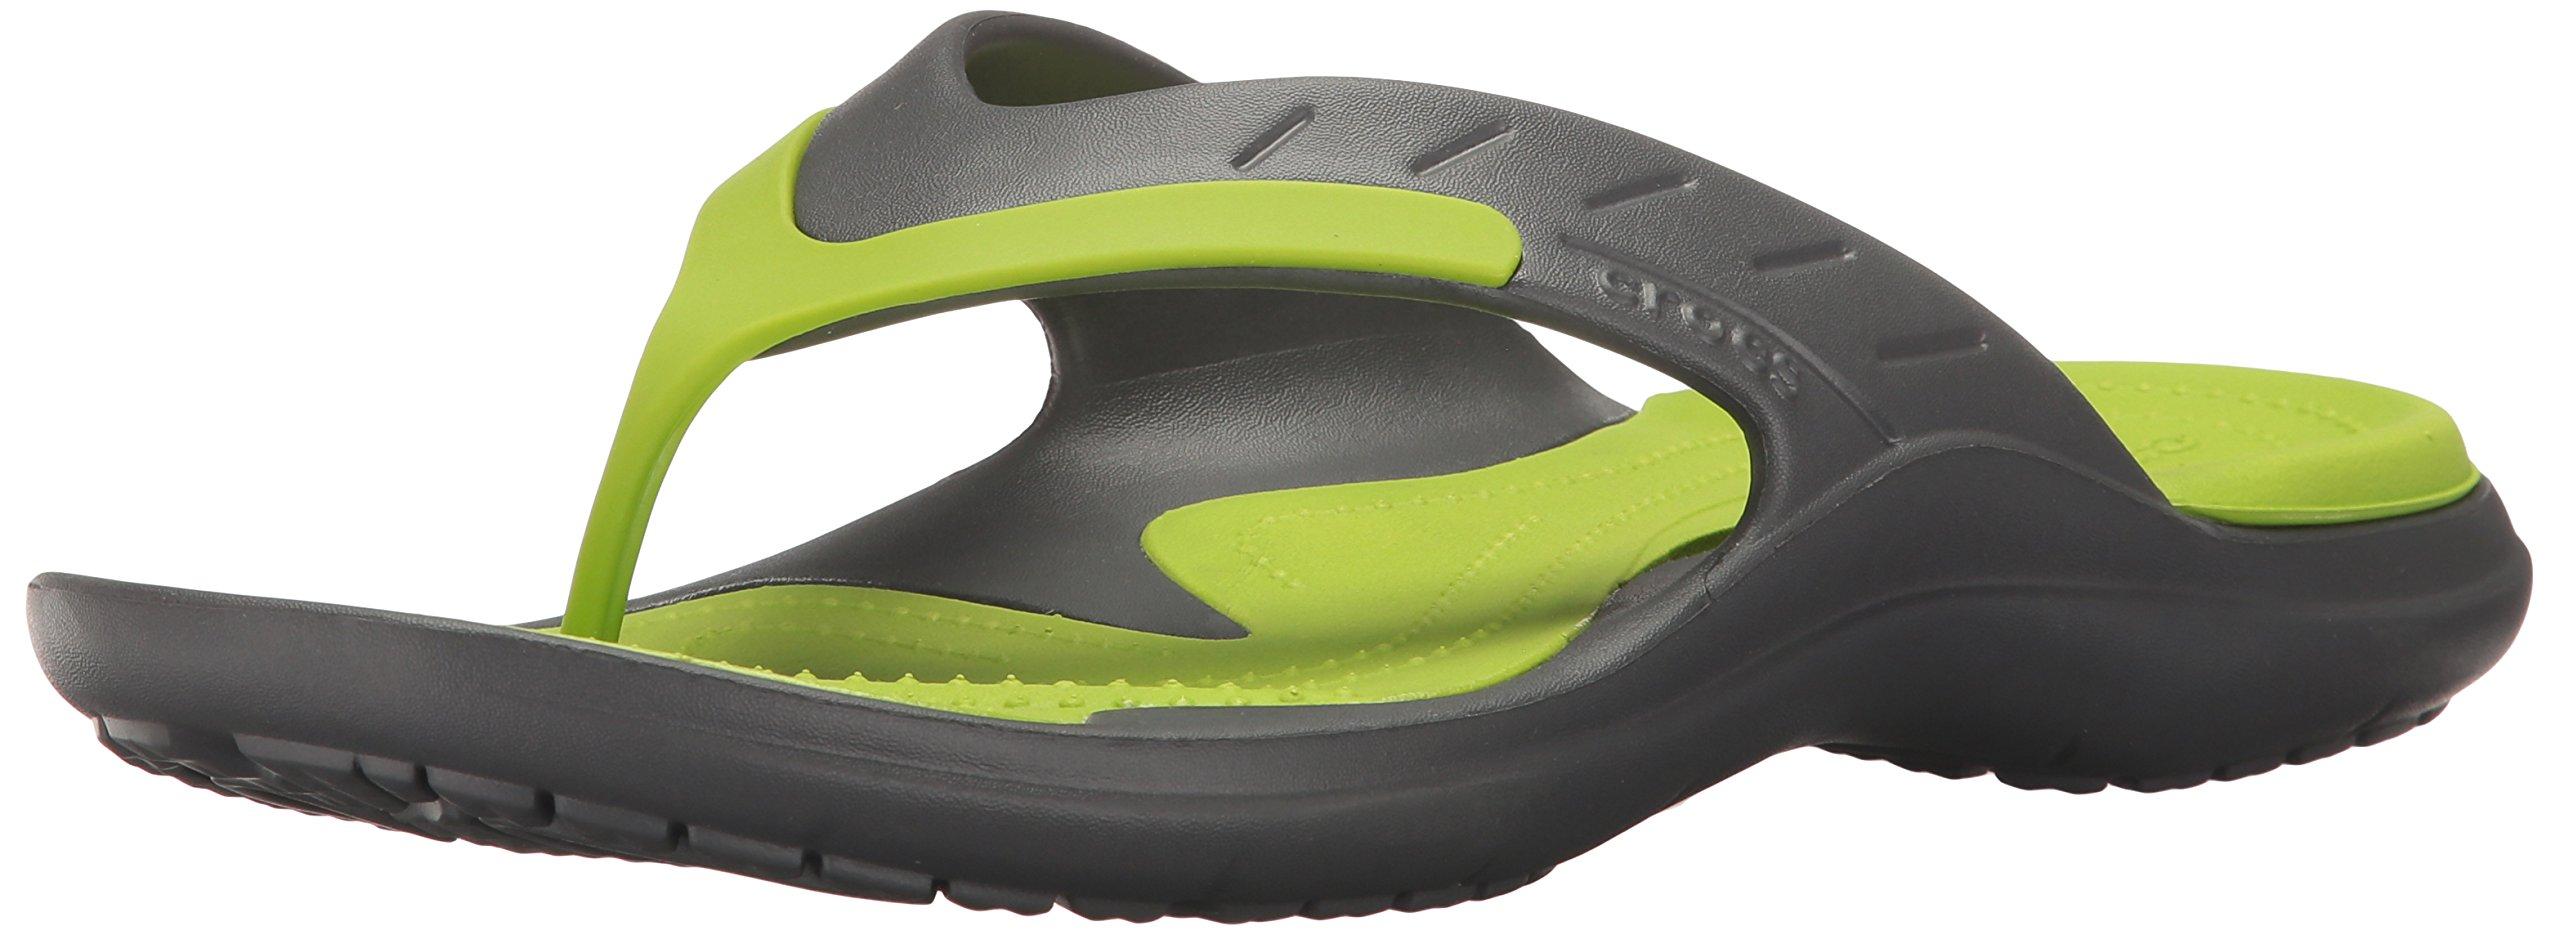 Crocs Unisex Modi Sport Flip Flop, Graphite/Volt Green, 43-44 EU/10 US Men/12 US Women